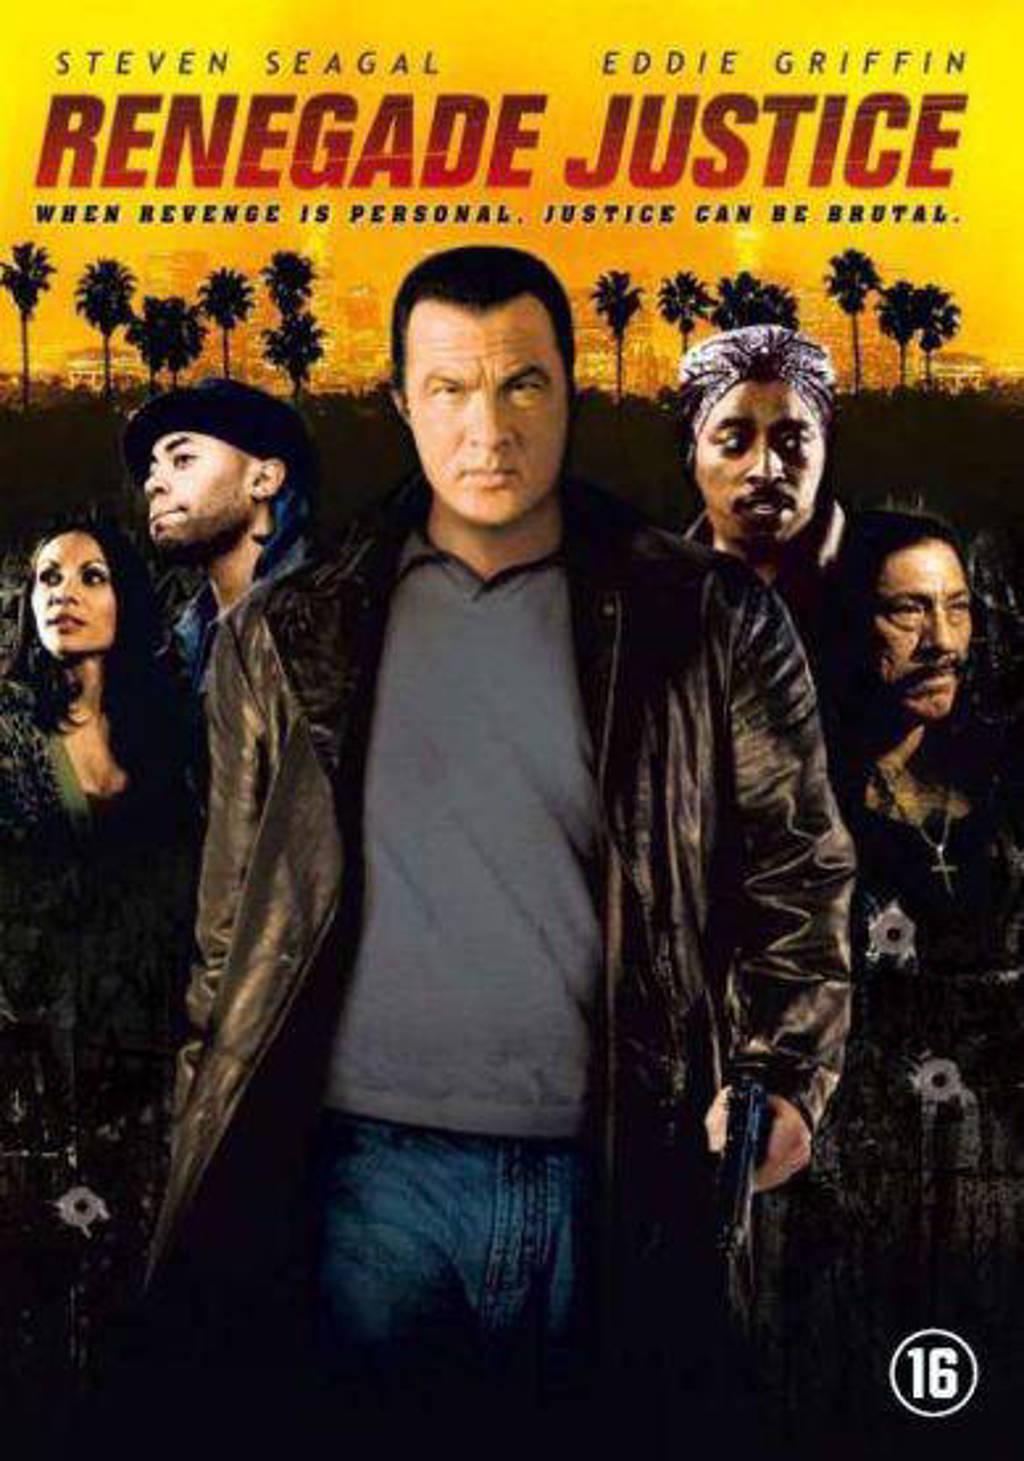 Renegade justice (DVD)